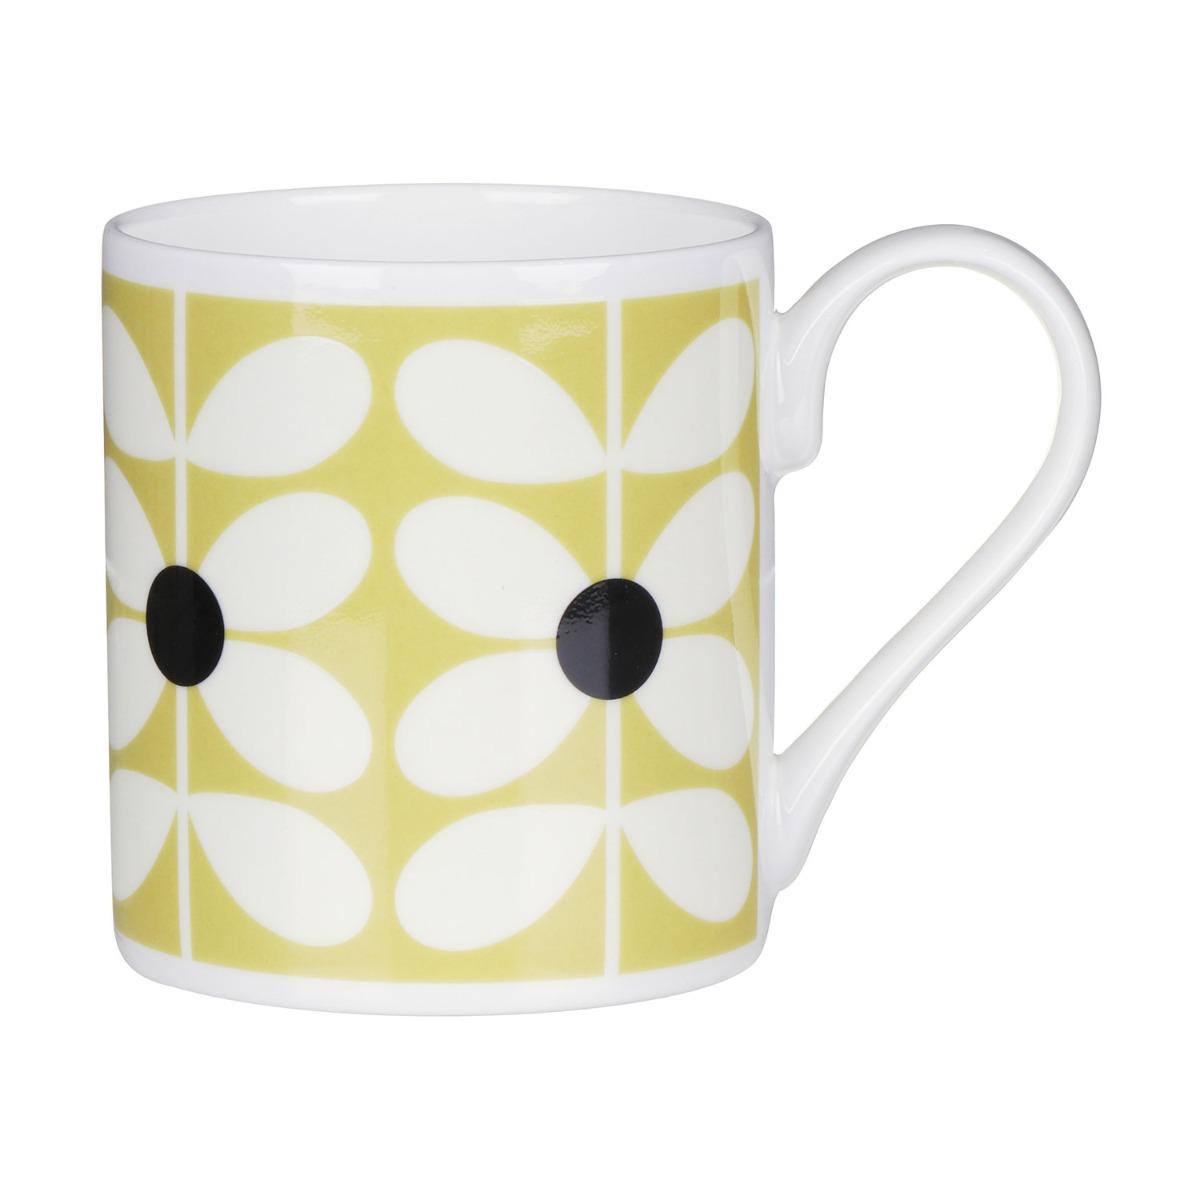 Orla Kiely 60's Stem Ochre Standard Mug